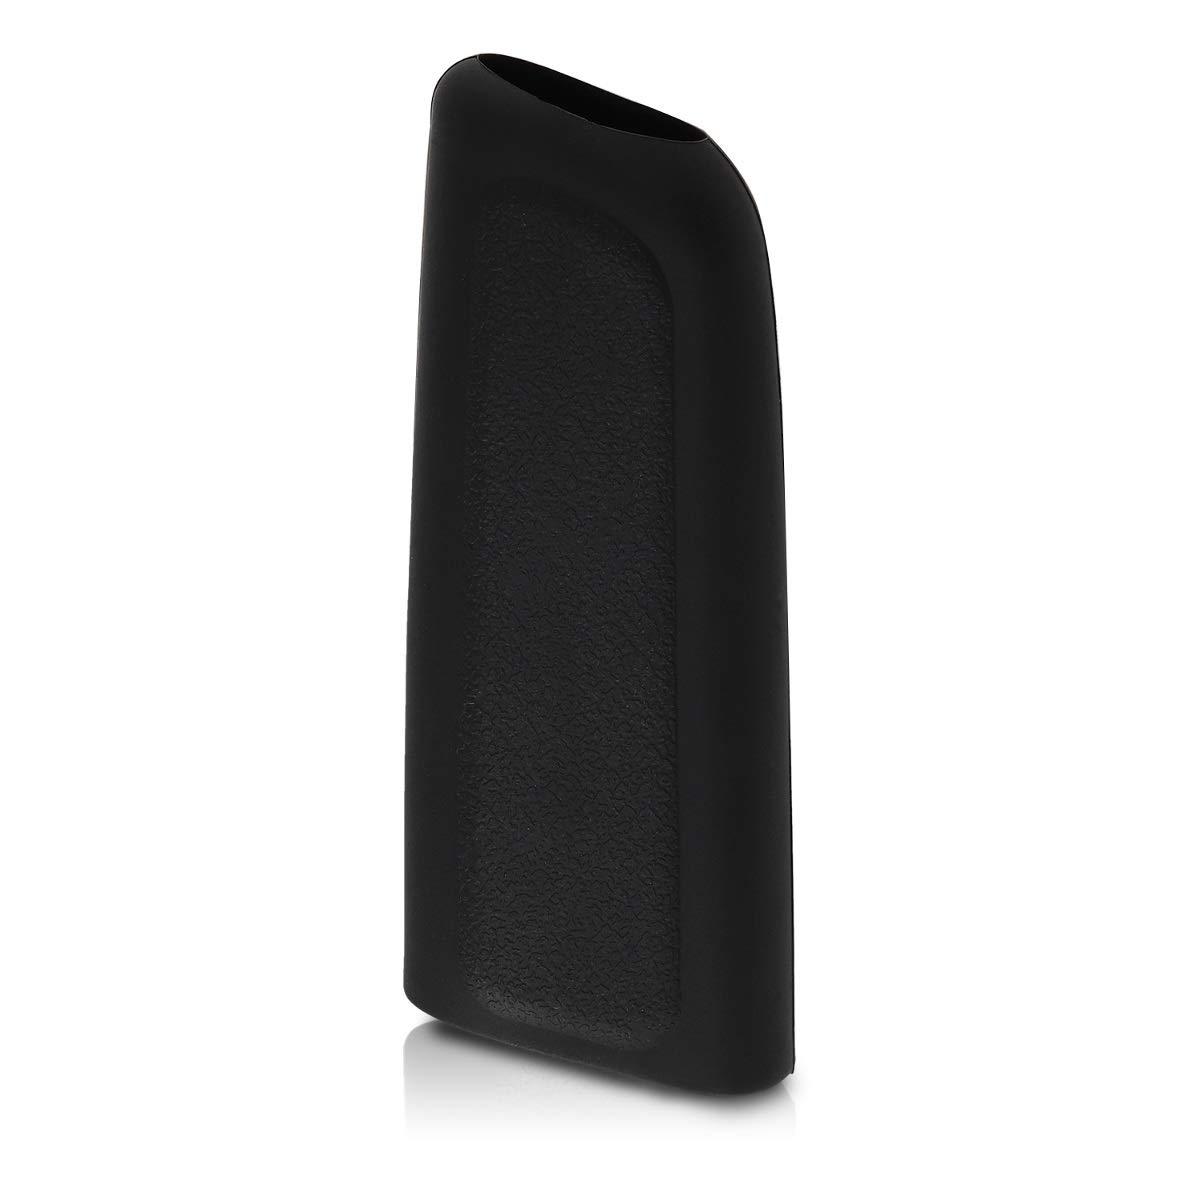 11,5 x 4,5 cm Innenma/ße kwmobile Universal Silikon H/ülle f/ür Handbremse Cover Case Schutzh/ülle Handbremse in Schwarz